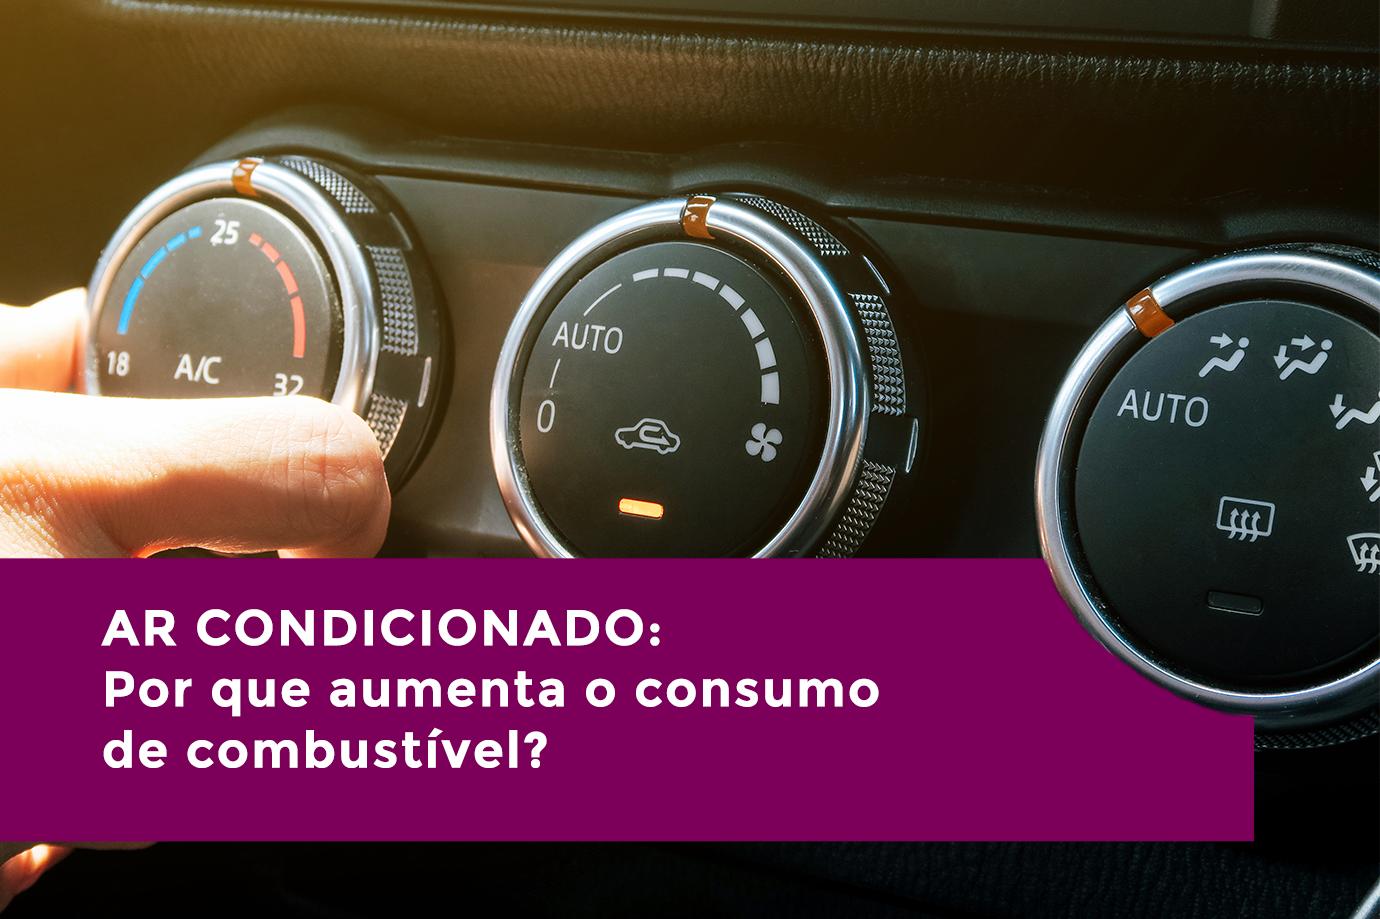 Ar-condicionado: por que aumenta o consumo de combustível?